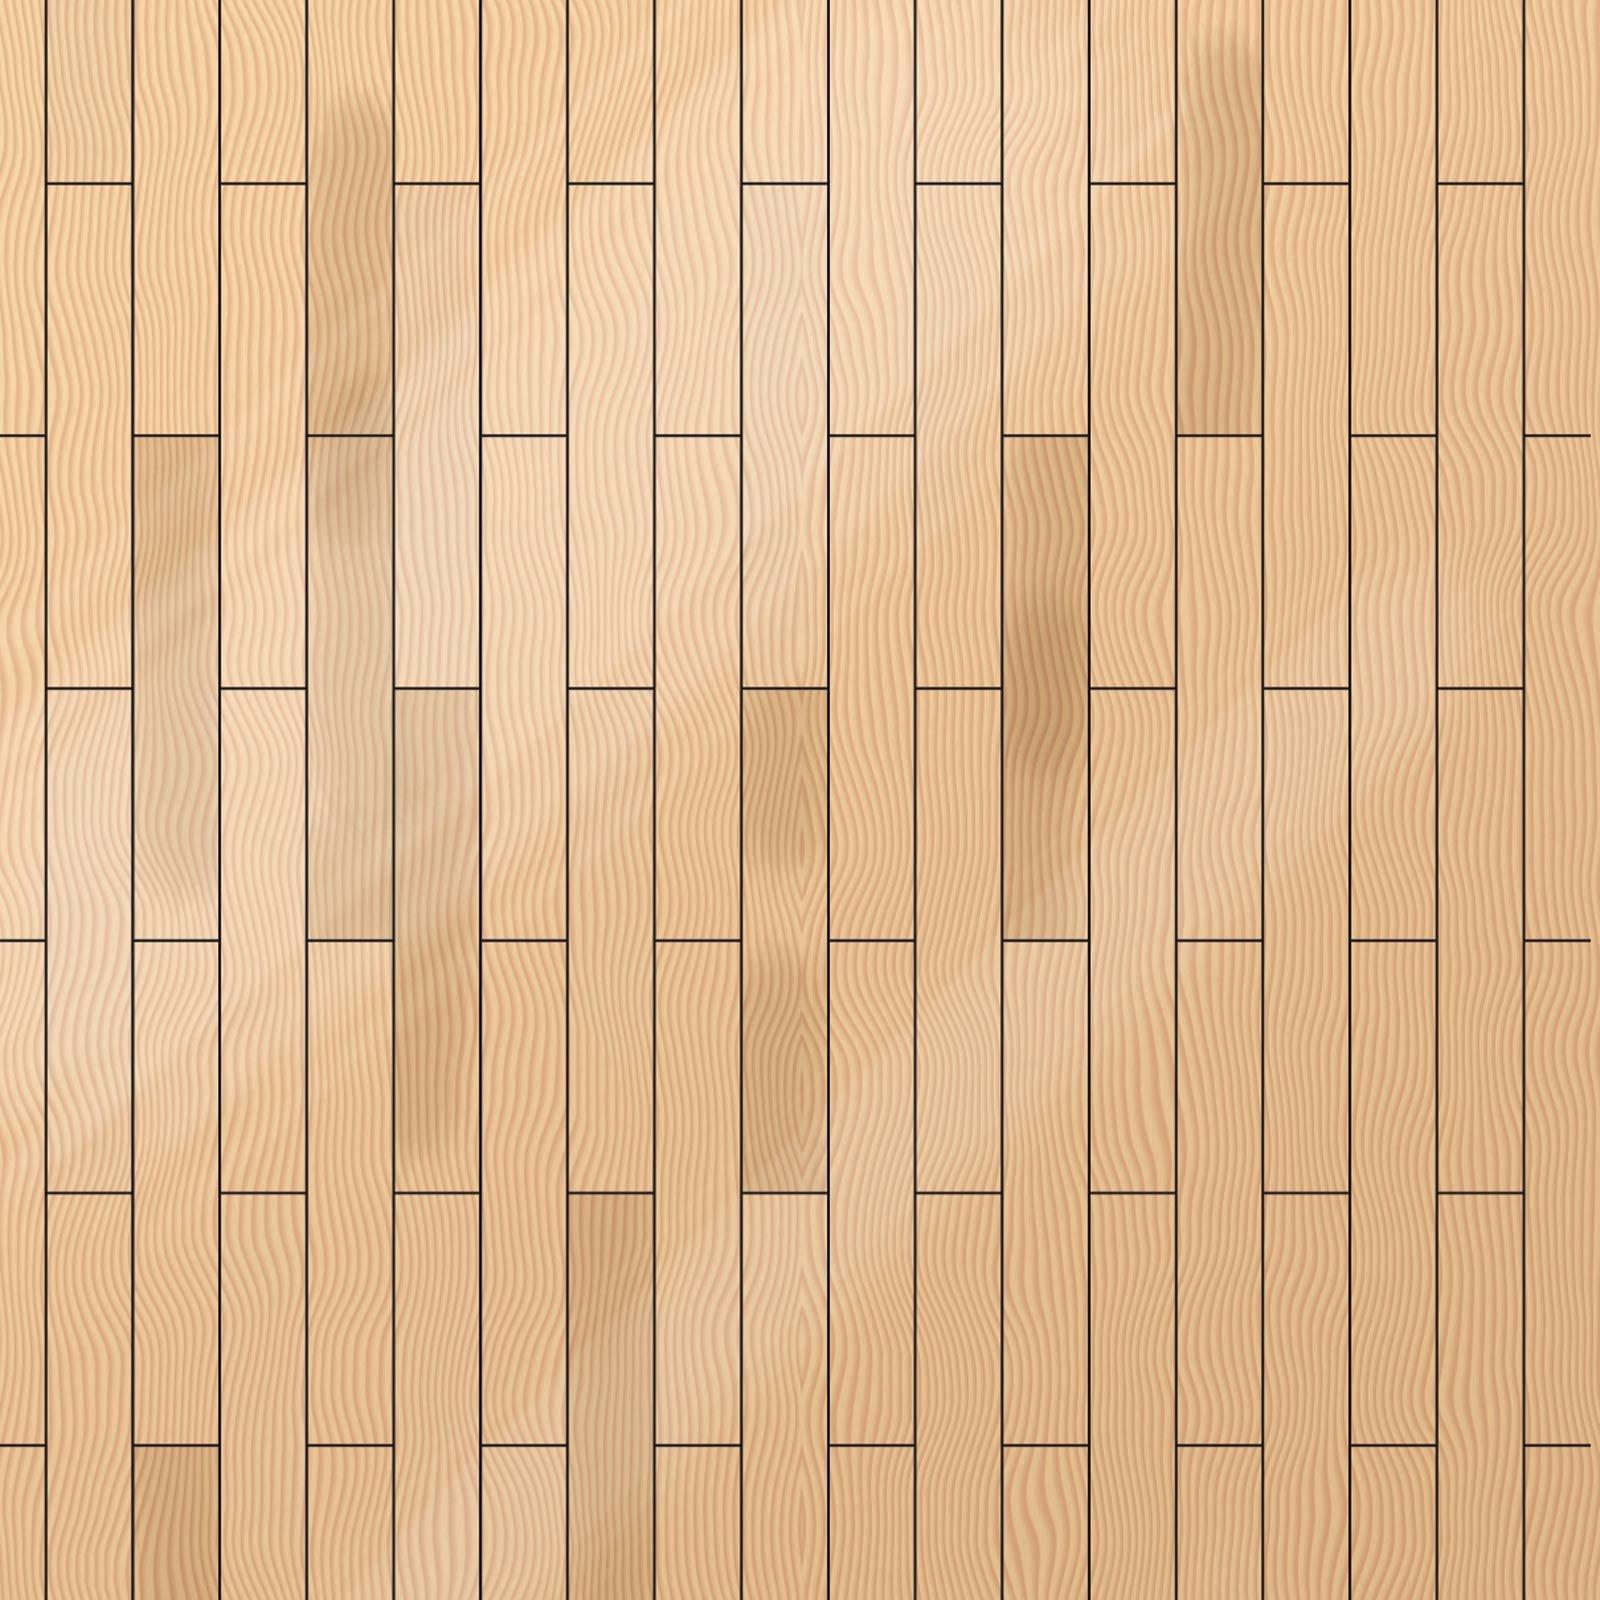 Parquet: geometrie e tipi di posa Cose di Casa